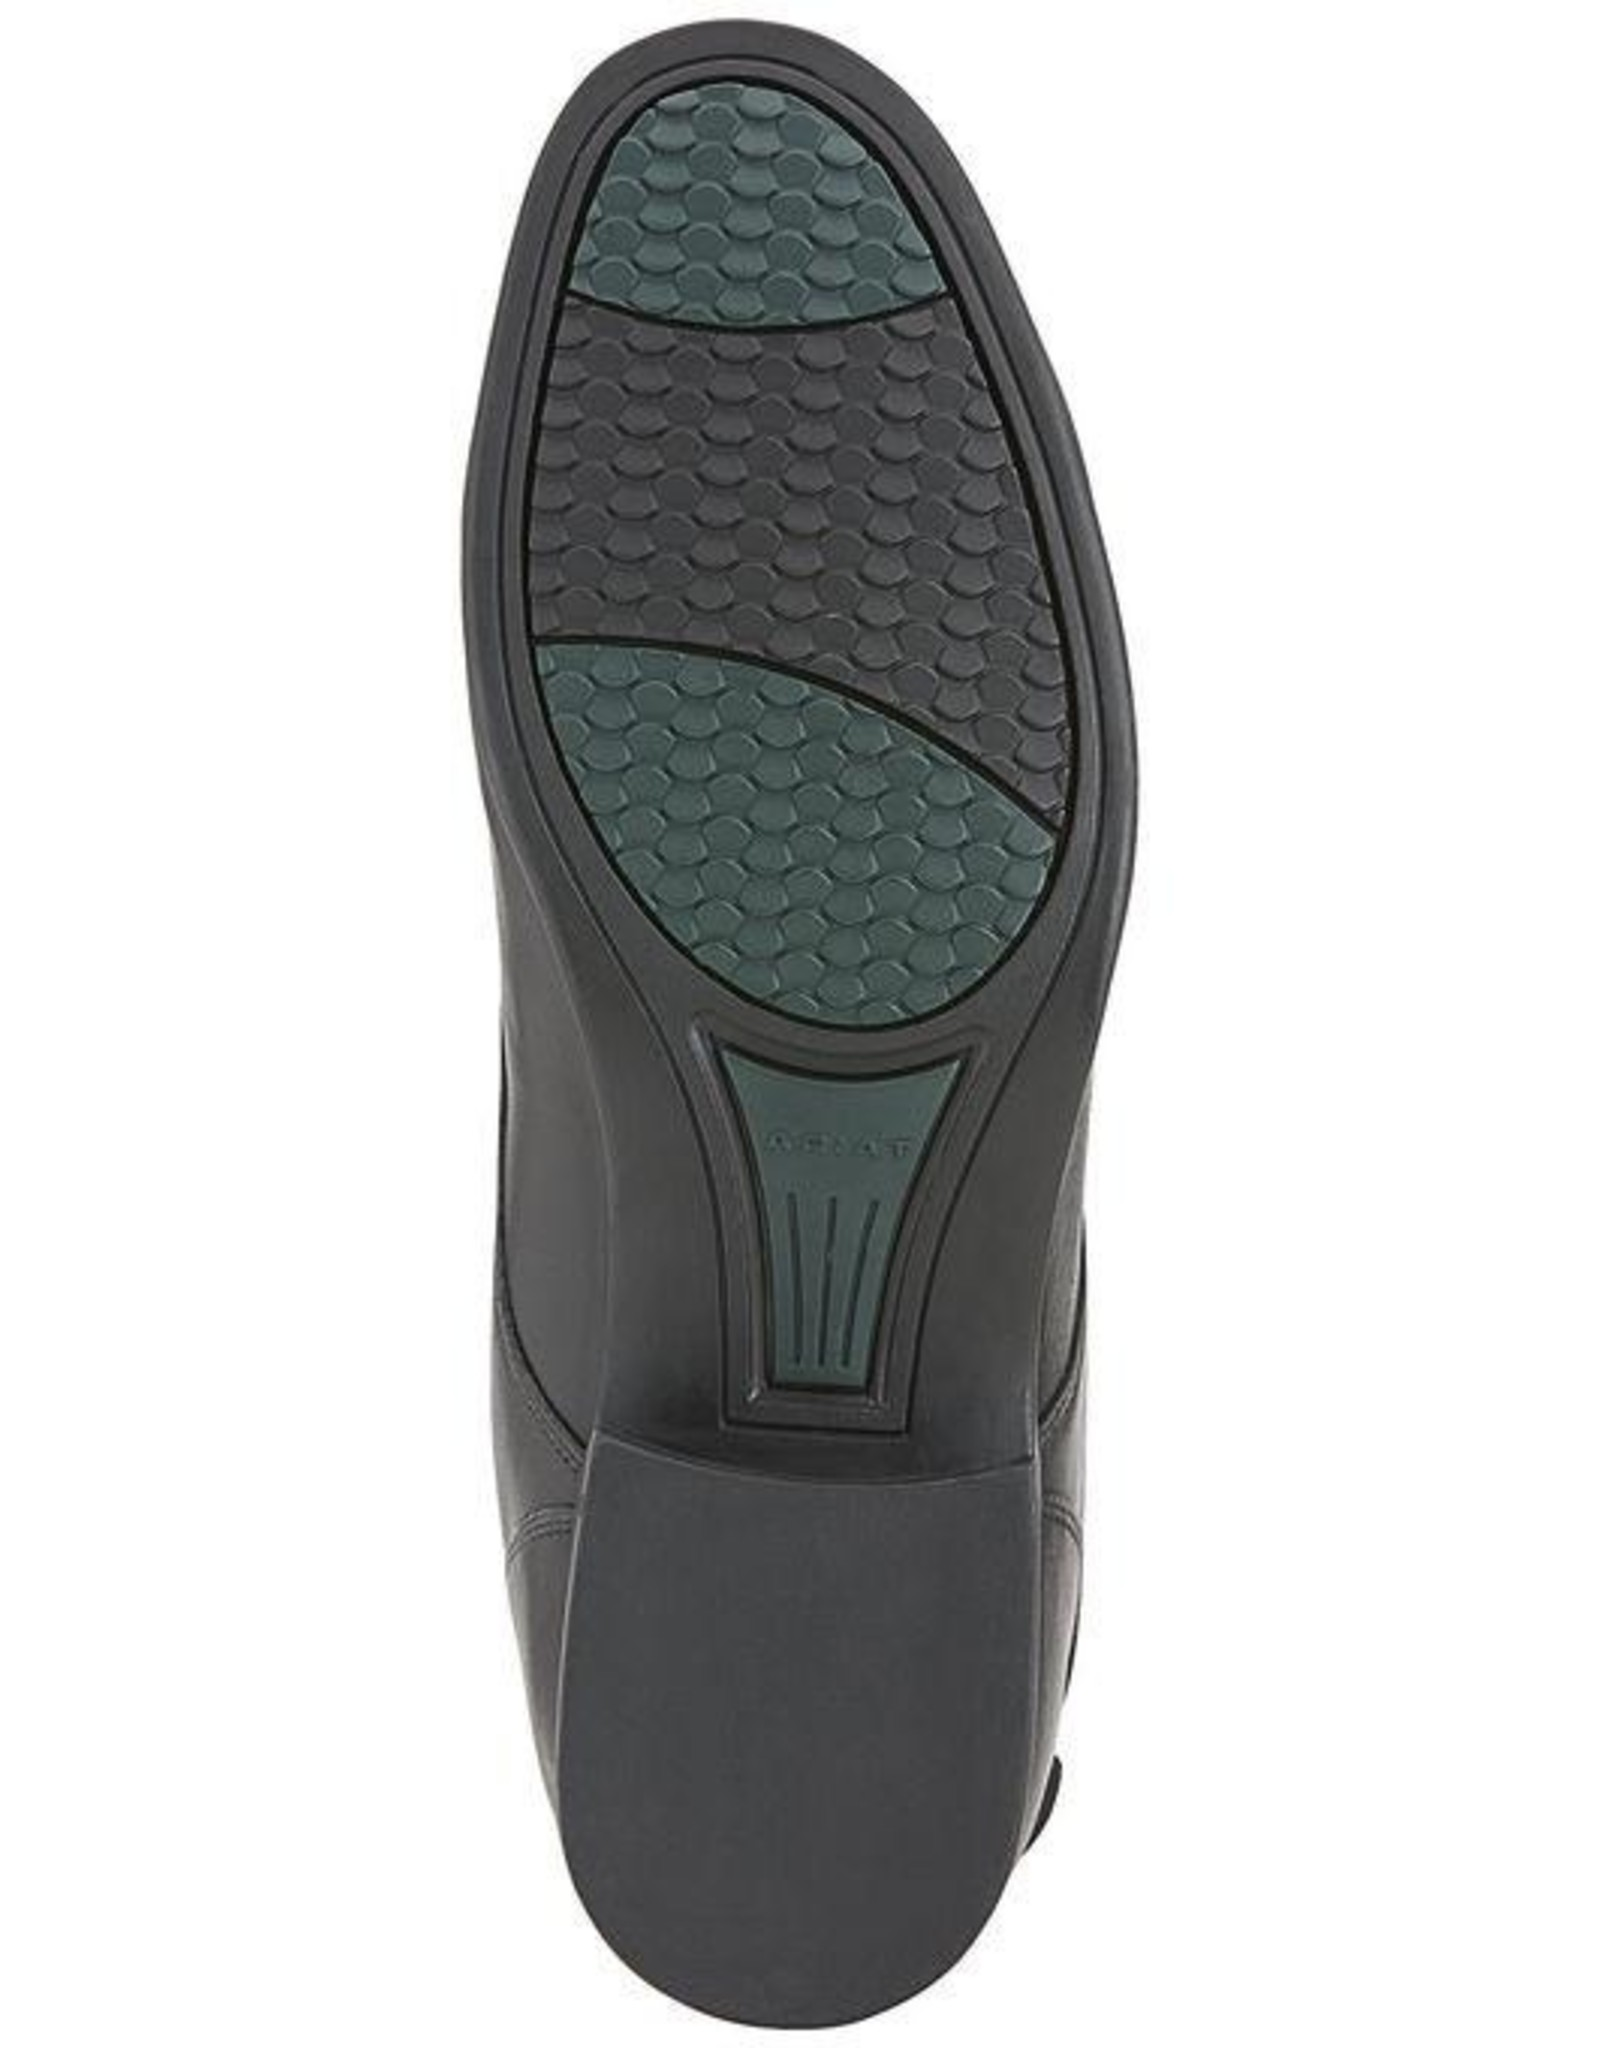 Ariat Men's Heritage Contour Field  Boot